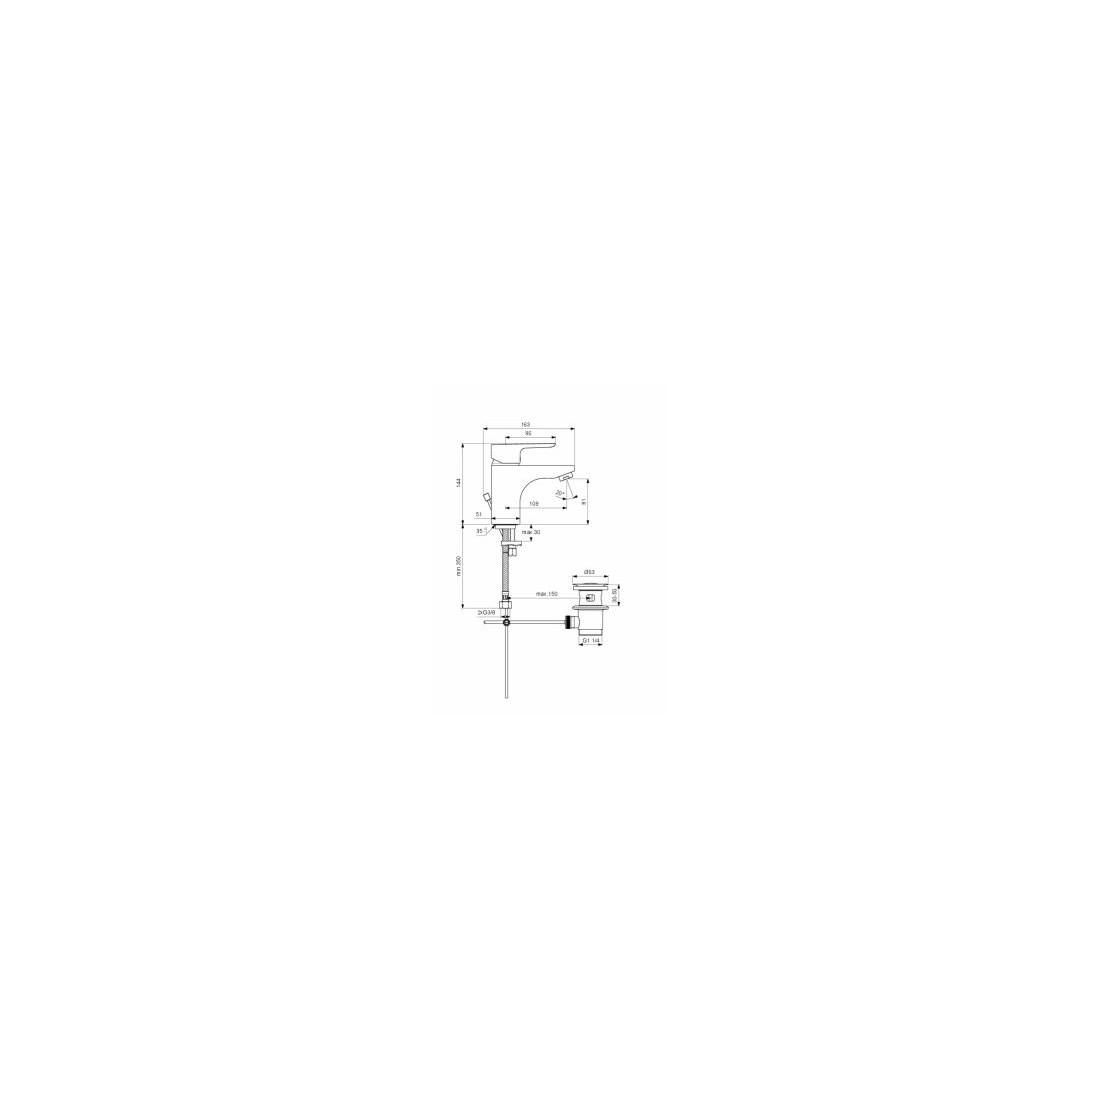 Maišytuvas Ideal Standard, Ceraplan III, praustuvui, Grande